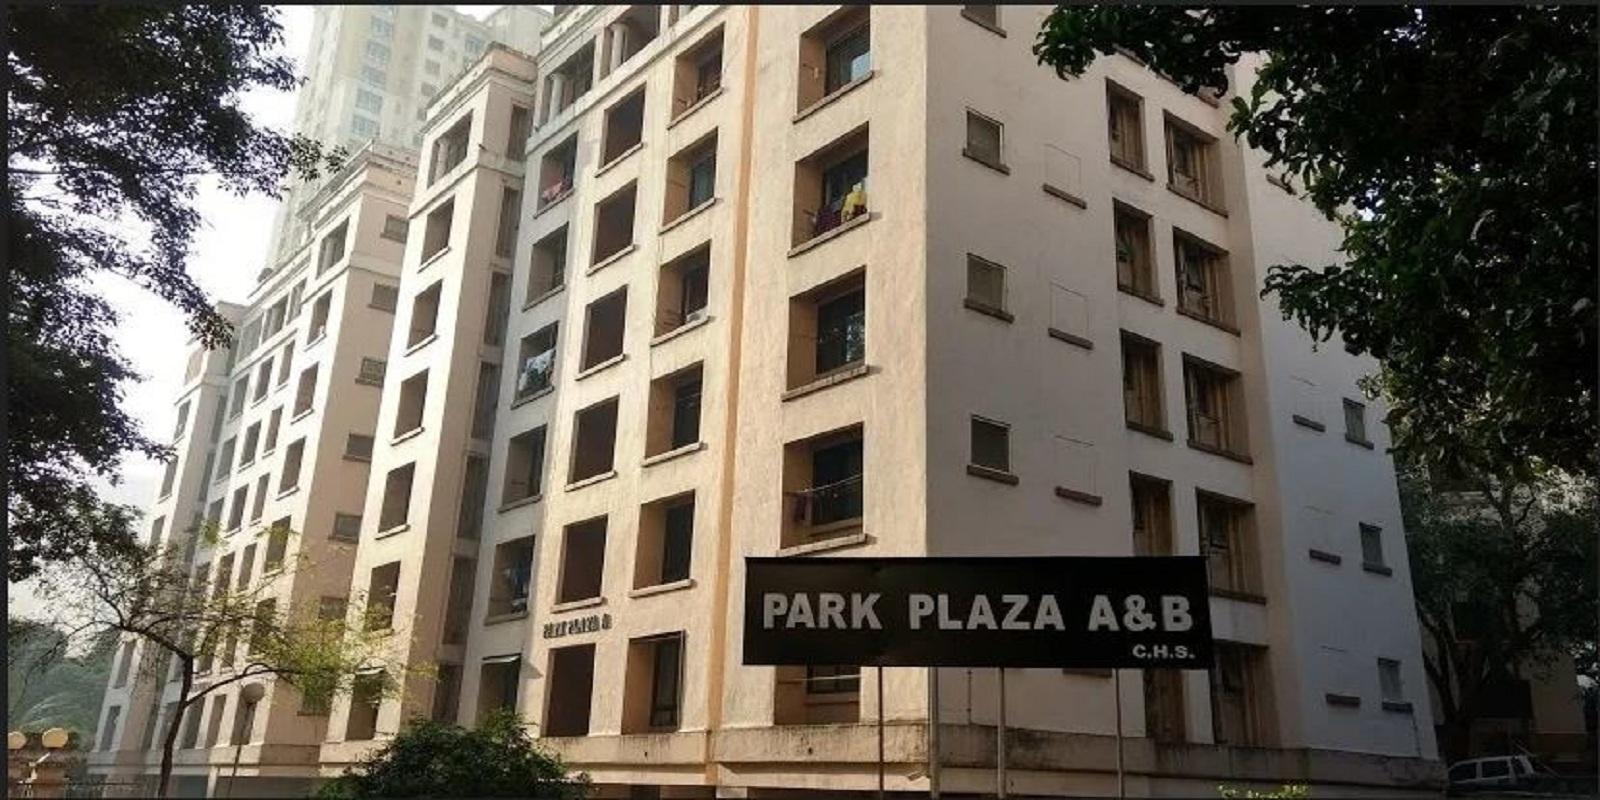 hiranandani estate park plaza a project project large image1